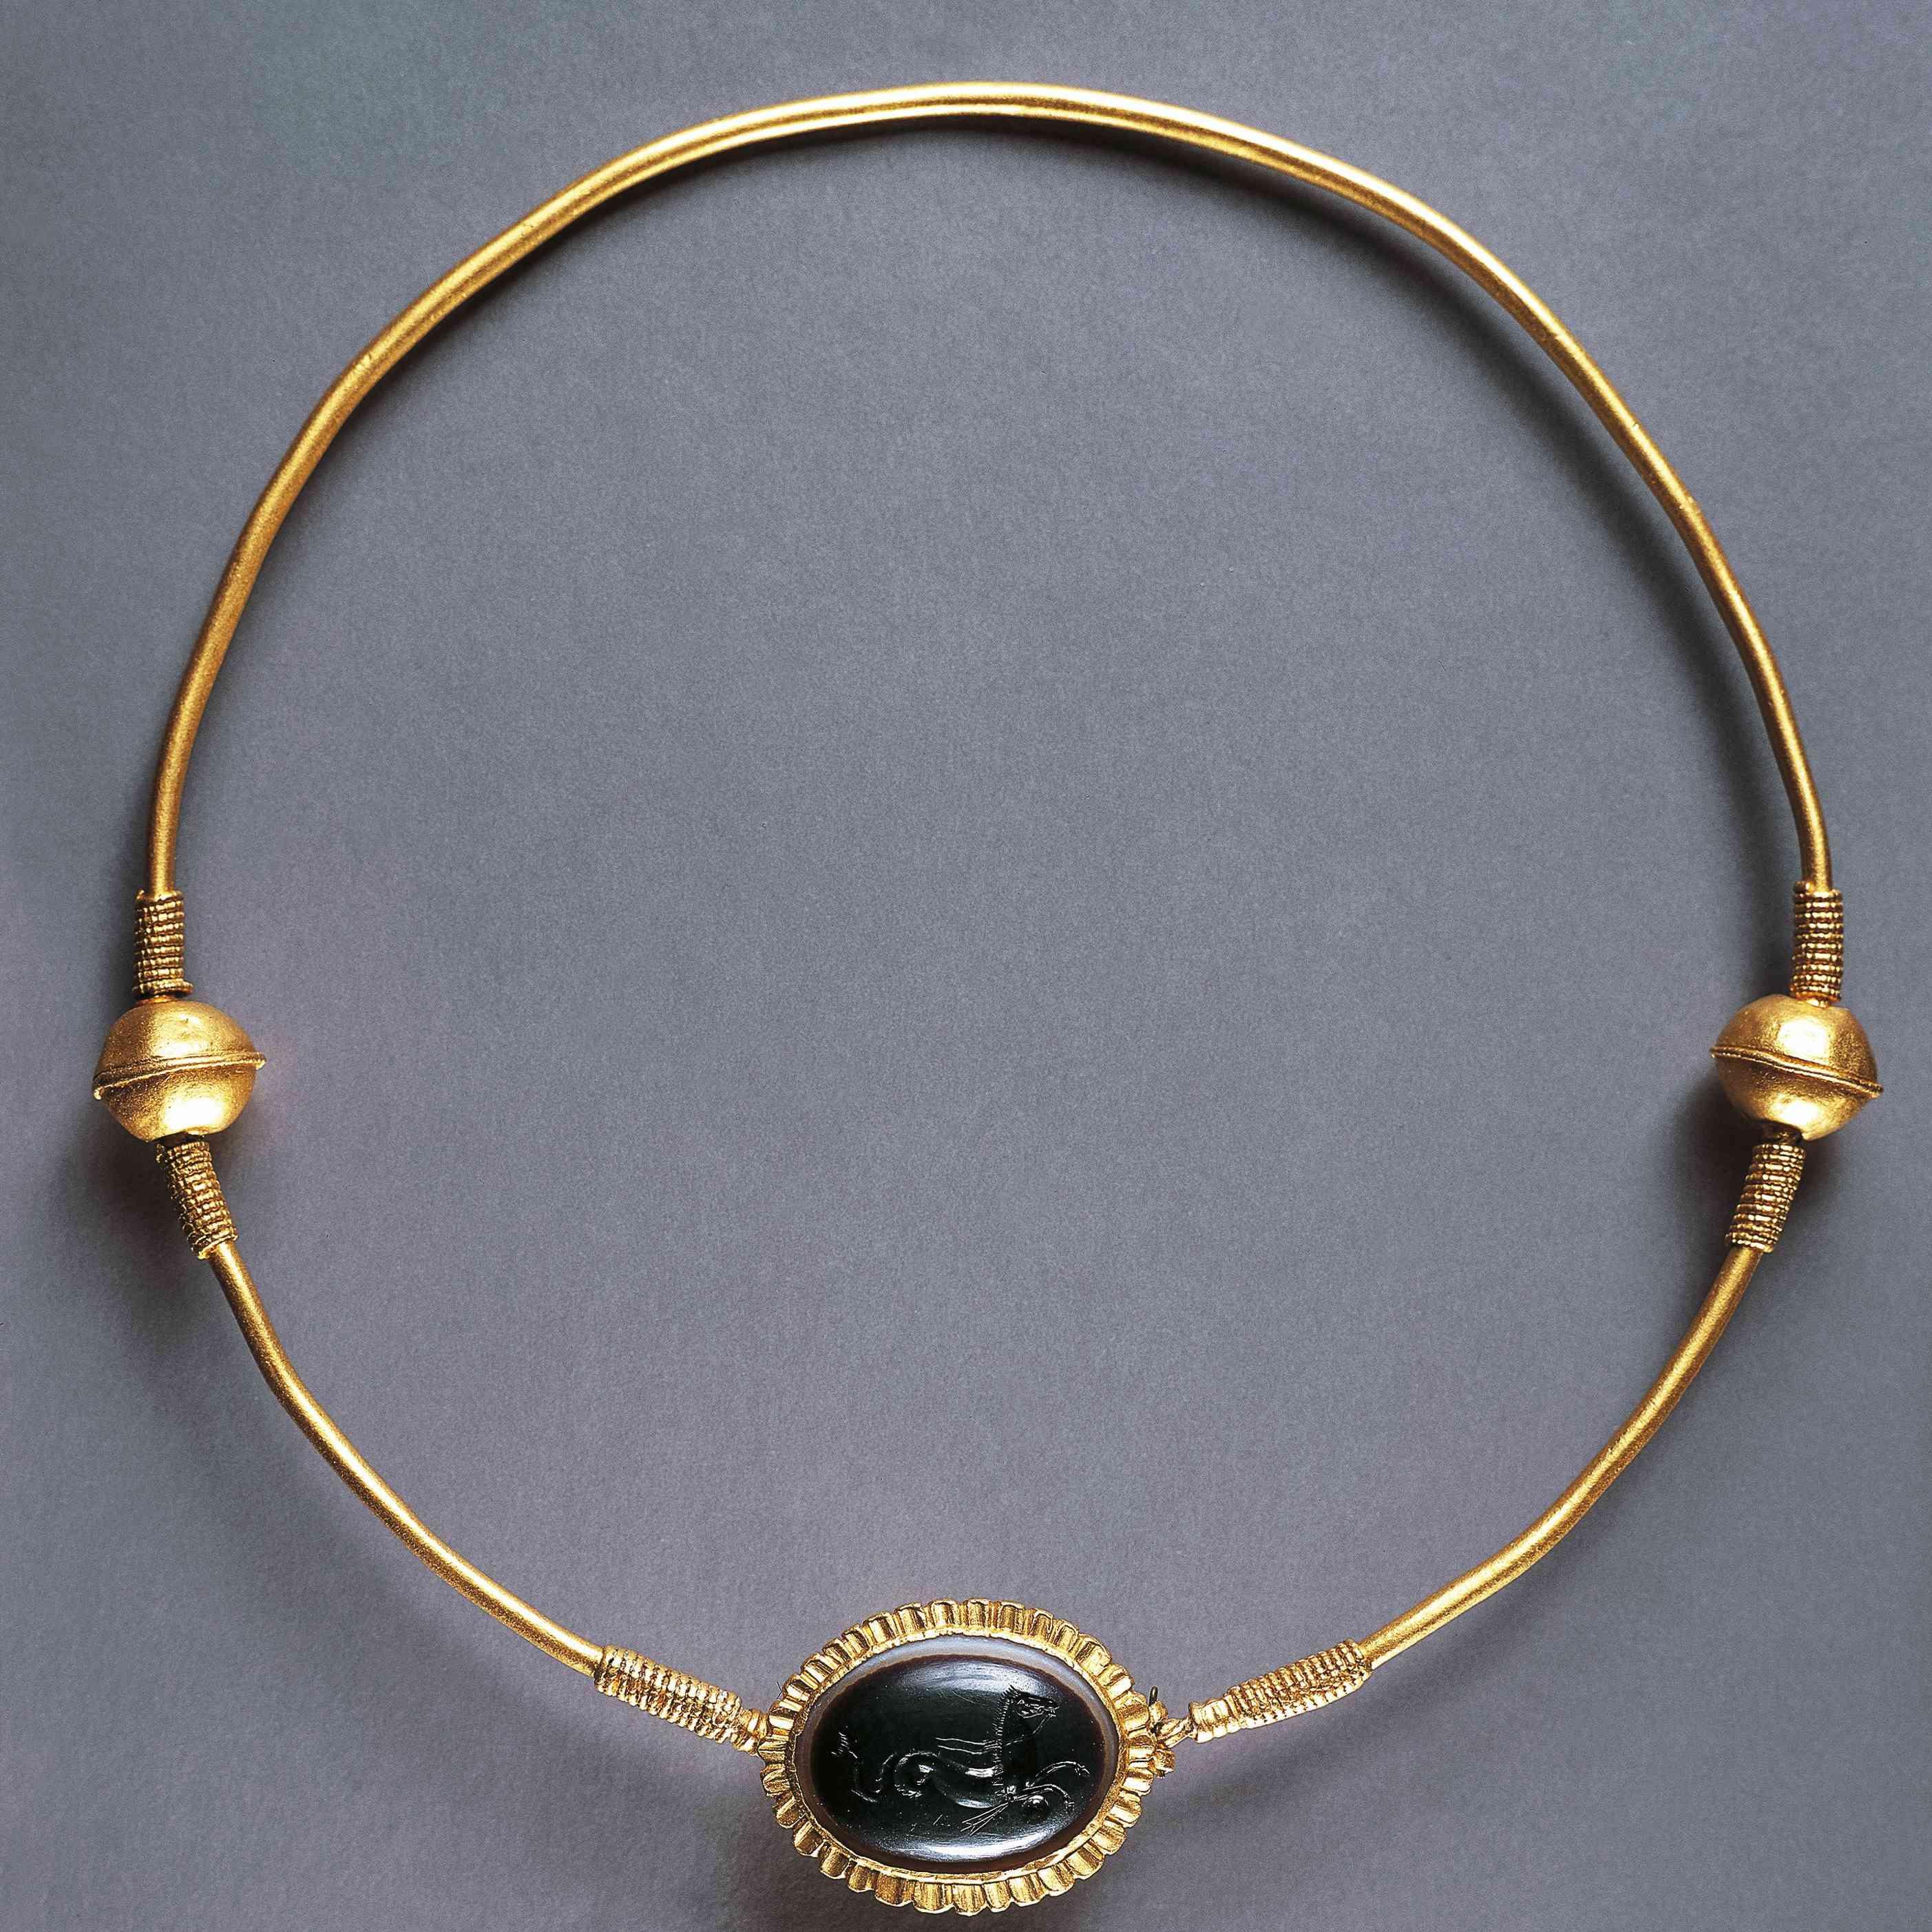 Goldsmithery, gold collar with sardonyx medallion